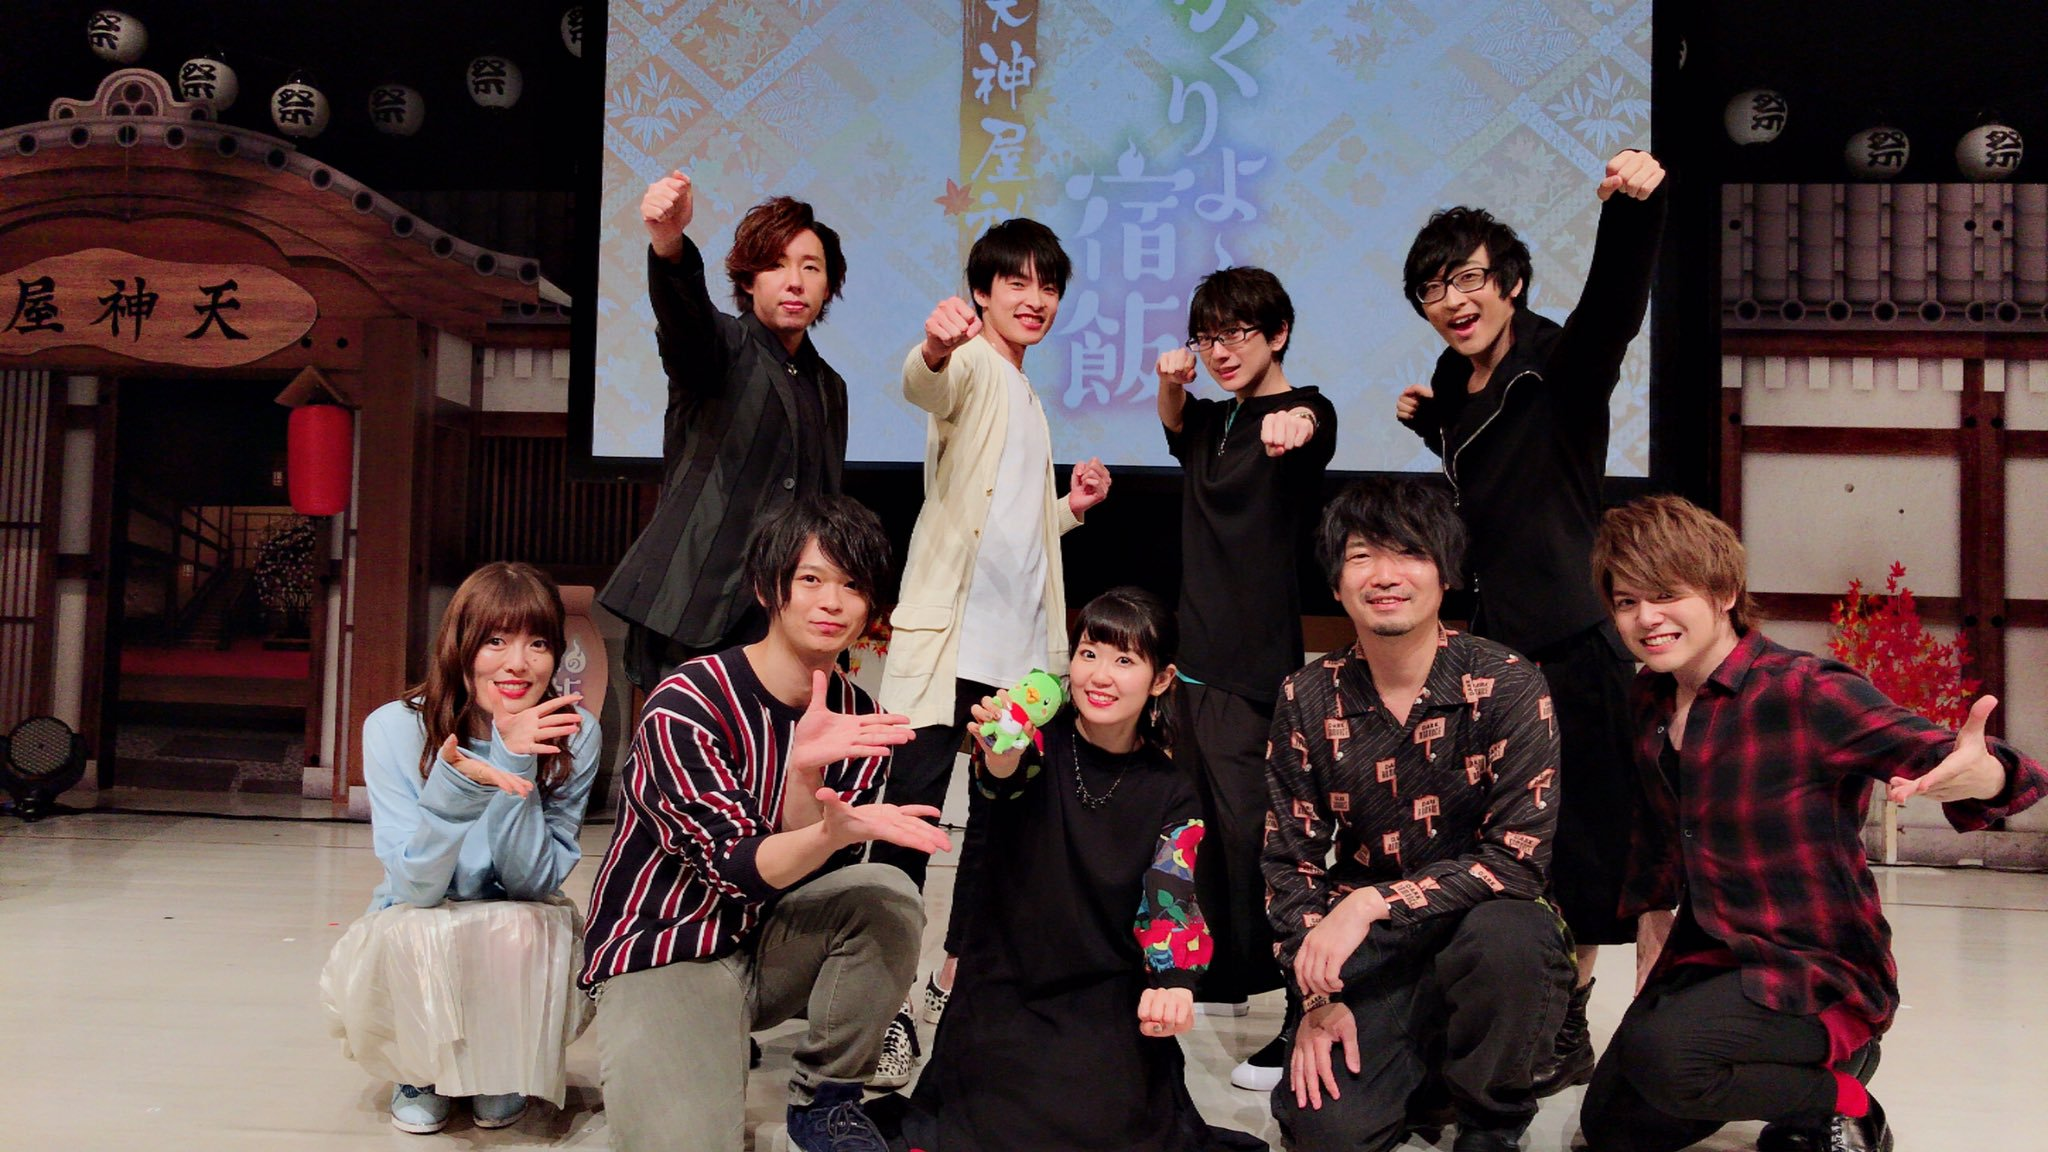 Nao Tôyama, Takuma Terashima, Ai Kakuma, Yuma Uchida, and Katsuya Konishi at an event for Kakuriyo no Yadomeshi (2018)